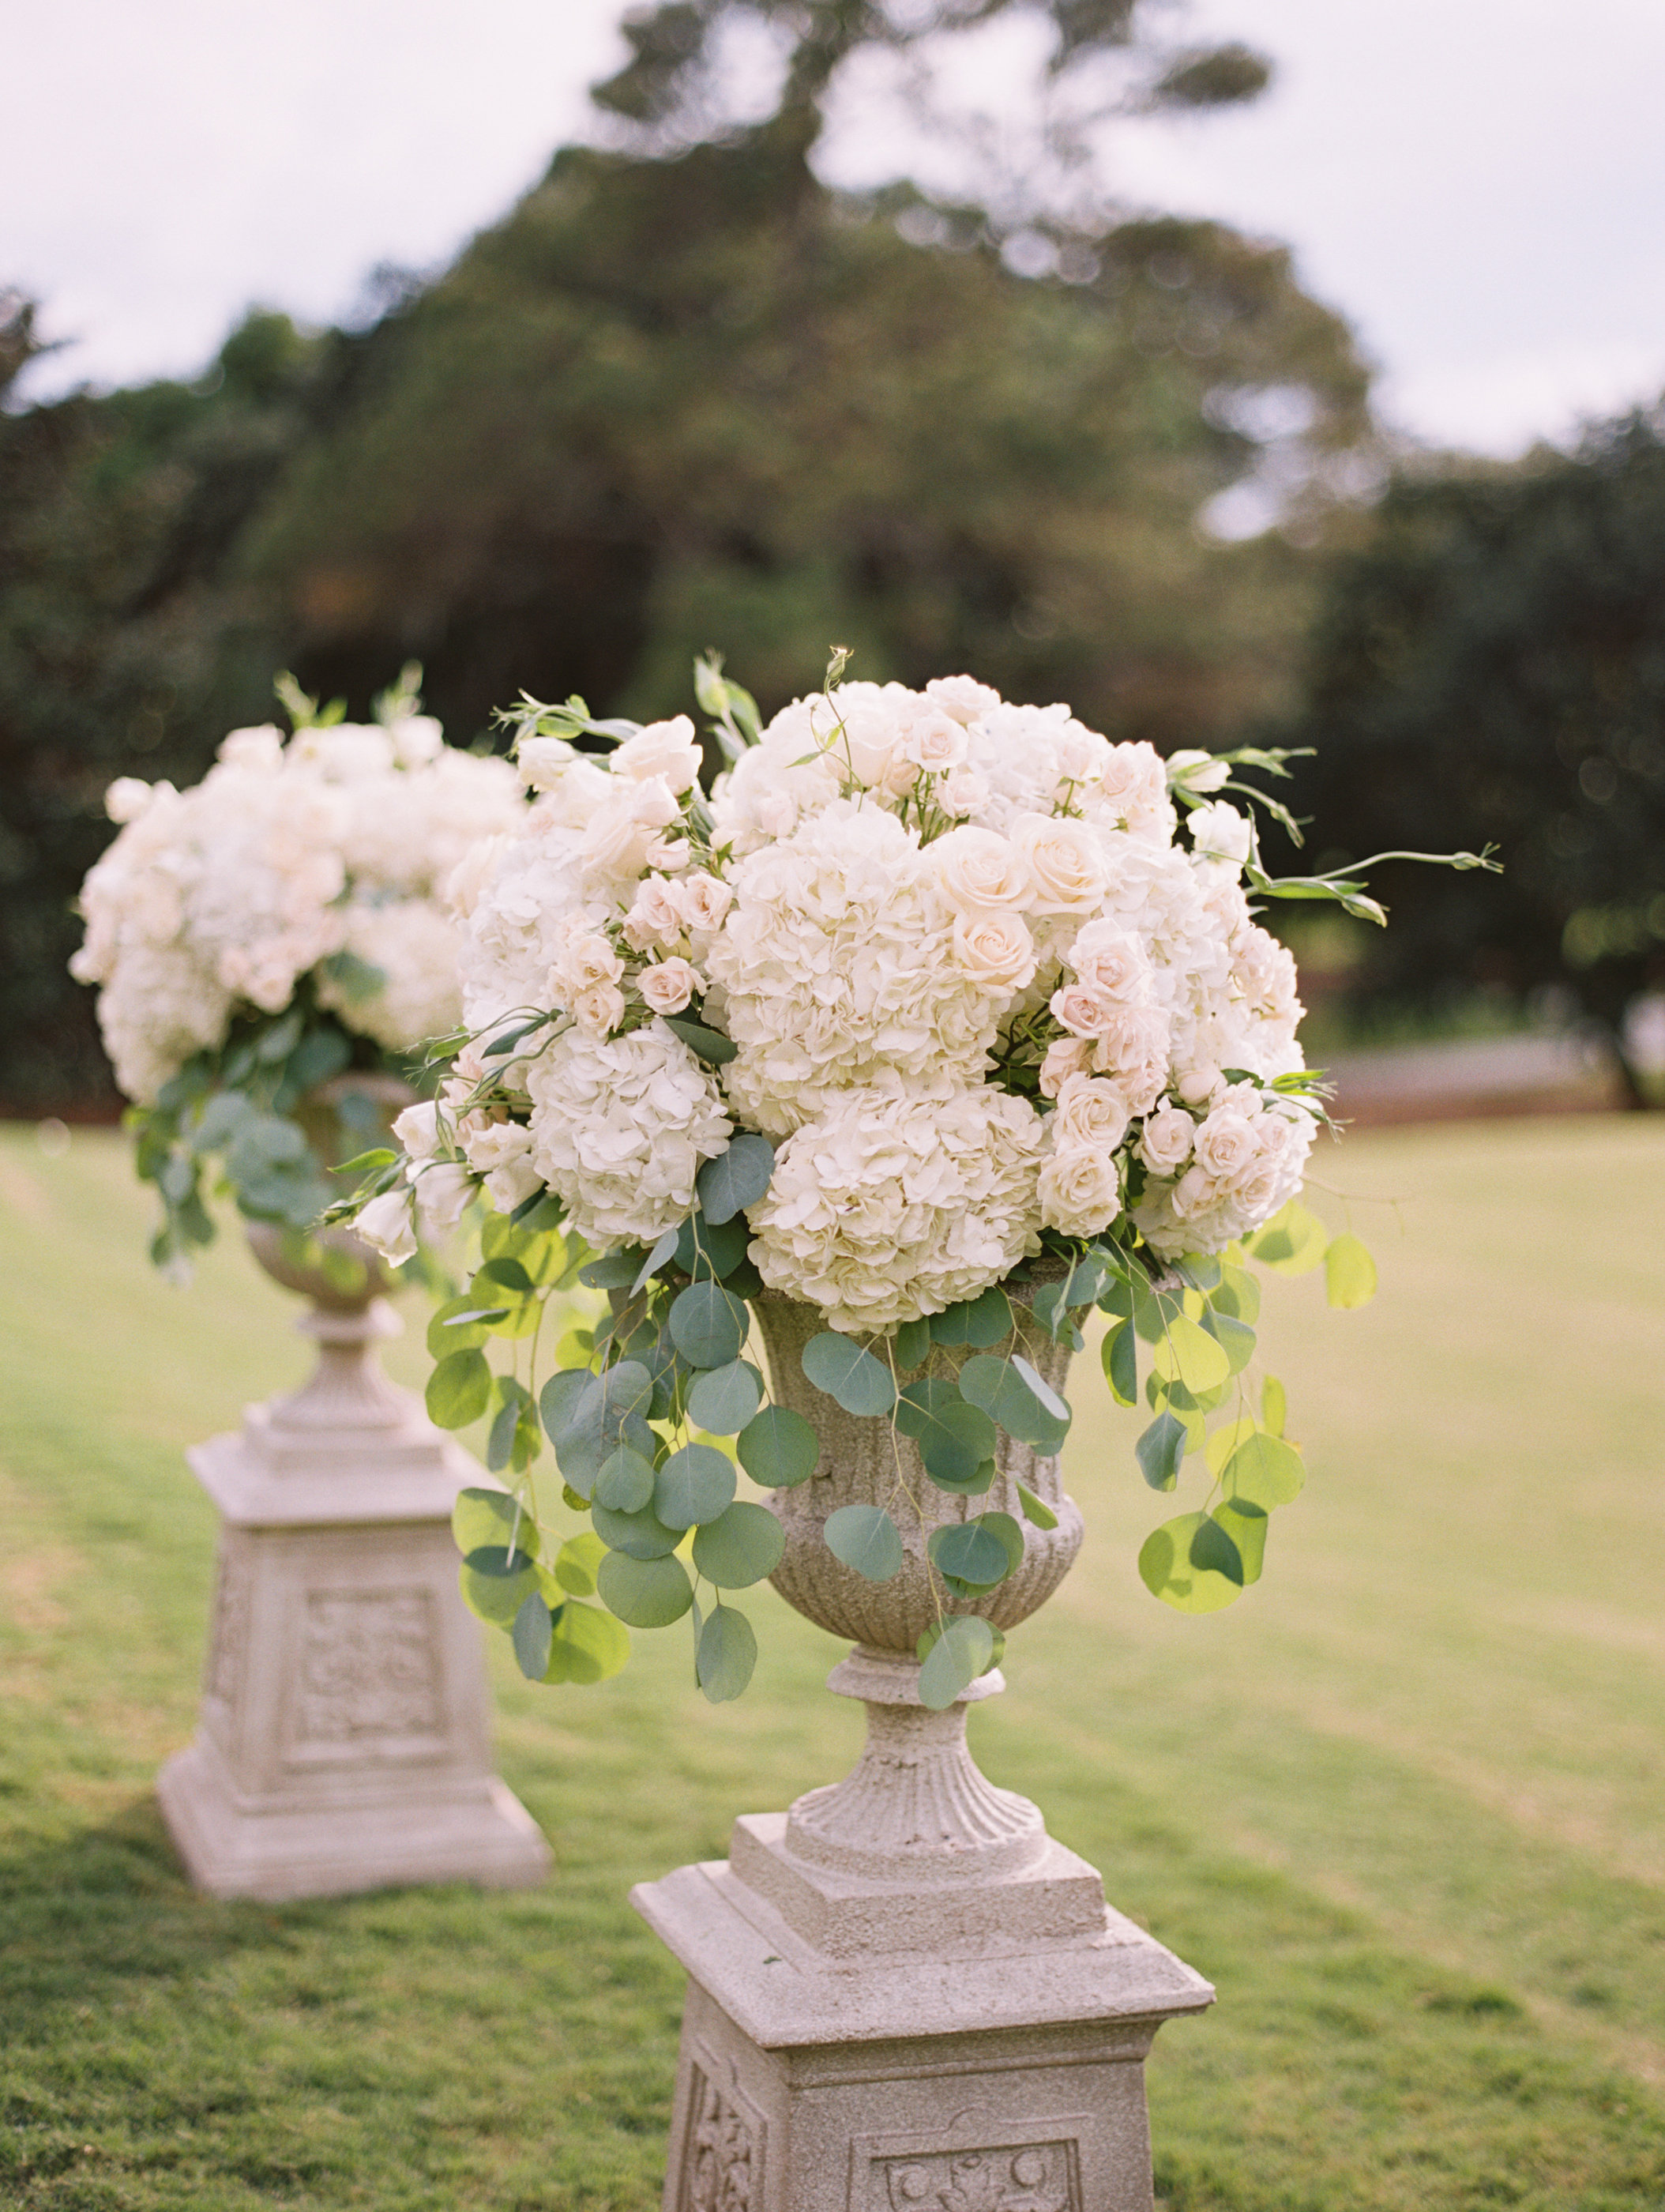 Flower Details - Kiawah Island, South Carolina - Fall Wedding - Julian Leaver Events